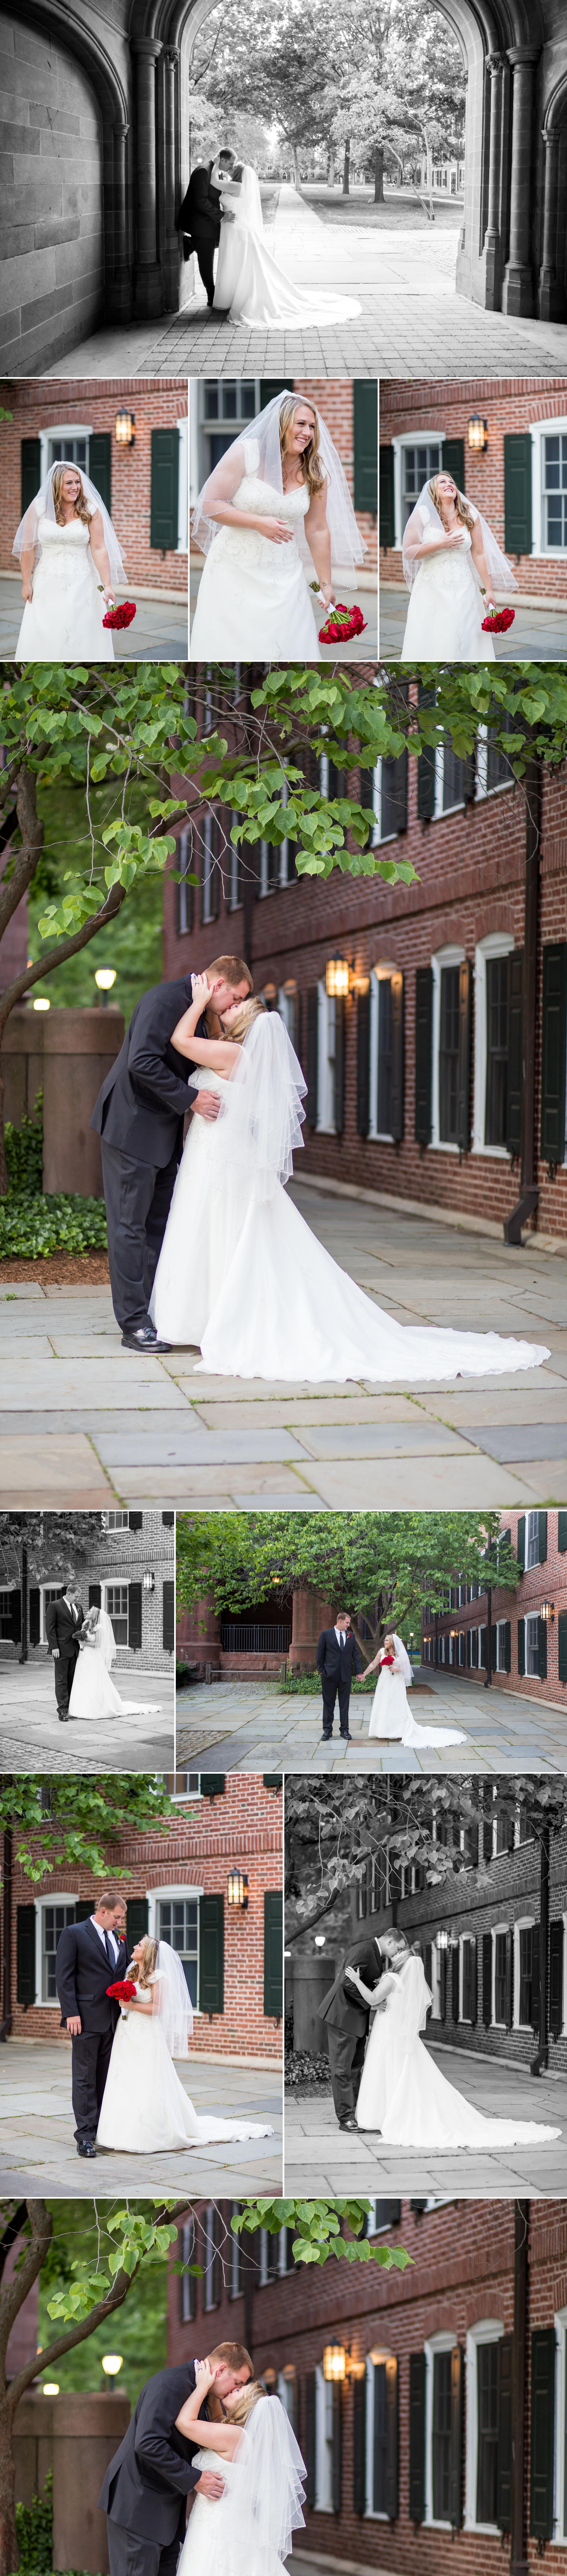 Ashley + Ryan | Cherish the Dress | Shaina Lee Photography | Connecticut + Destination Wedding Photographer | Connecticut Wedding | CT Wedding at Yale University | New Haven, CT Wedding